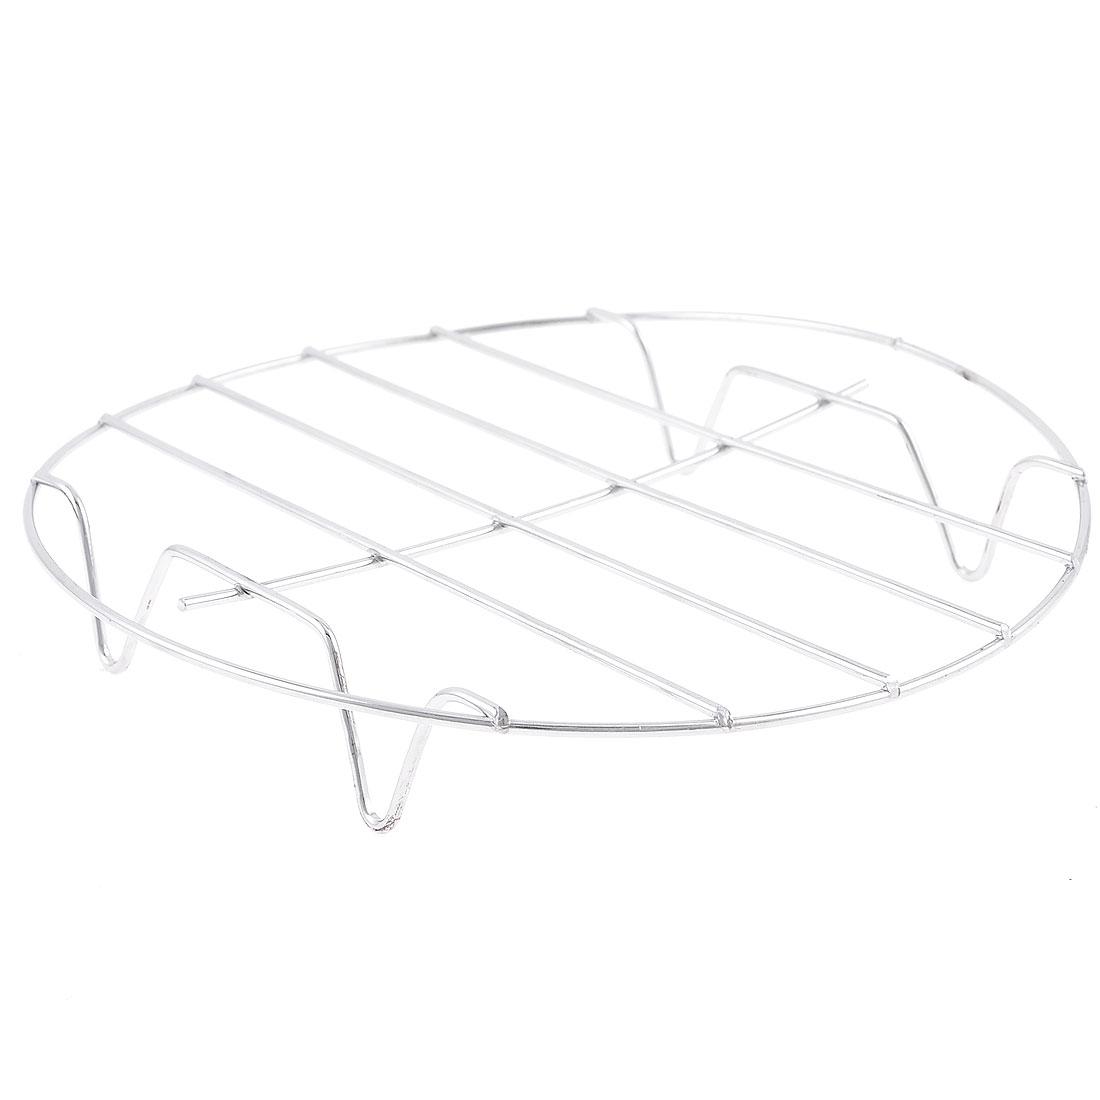 "Kitchen Cookware 4 Legs Stainless Steel Round Steaming Rack 6.9"" Diameter"